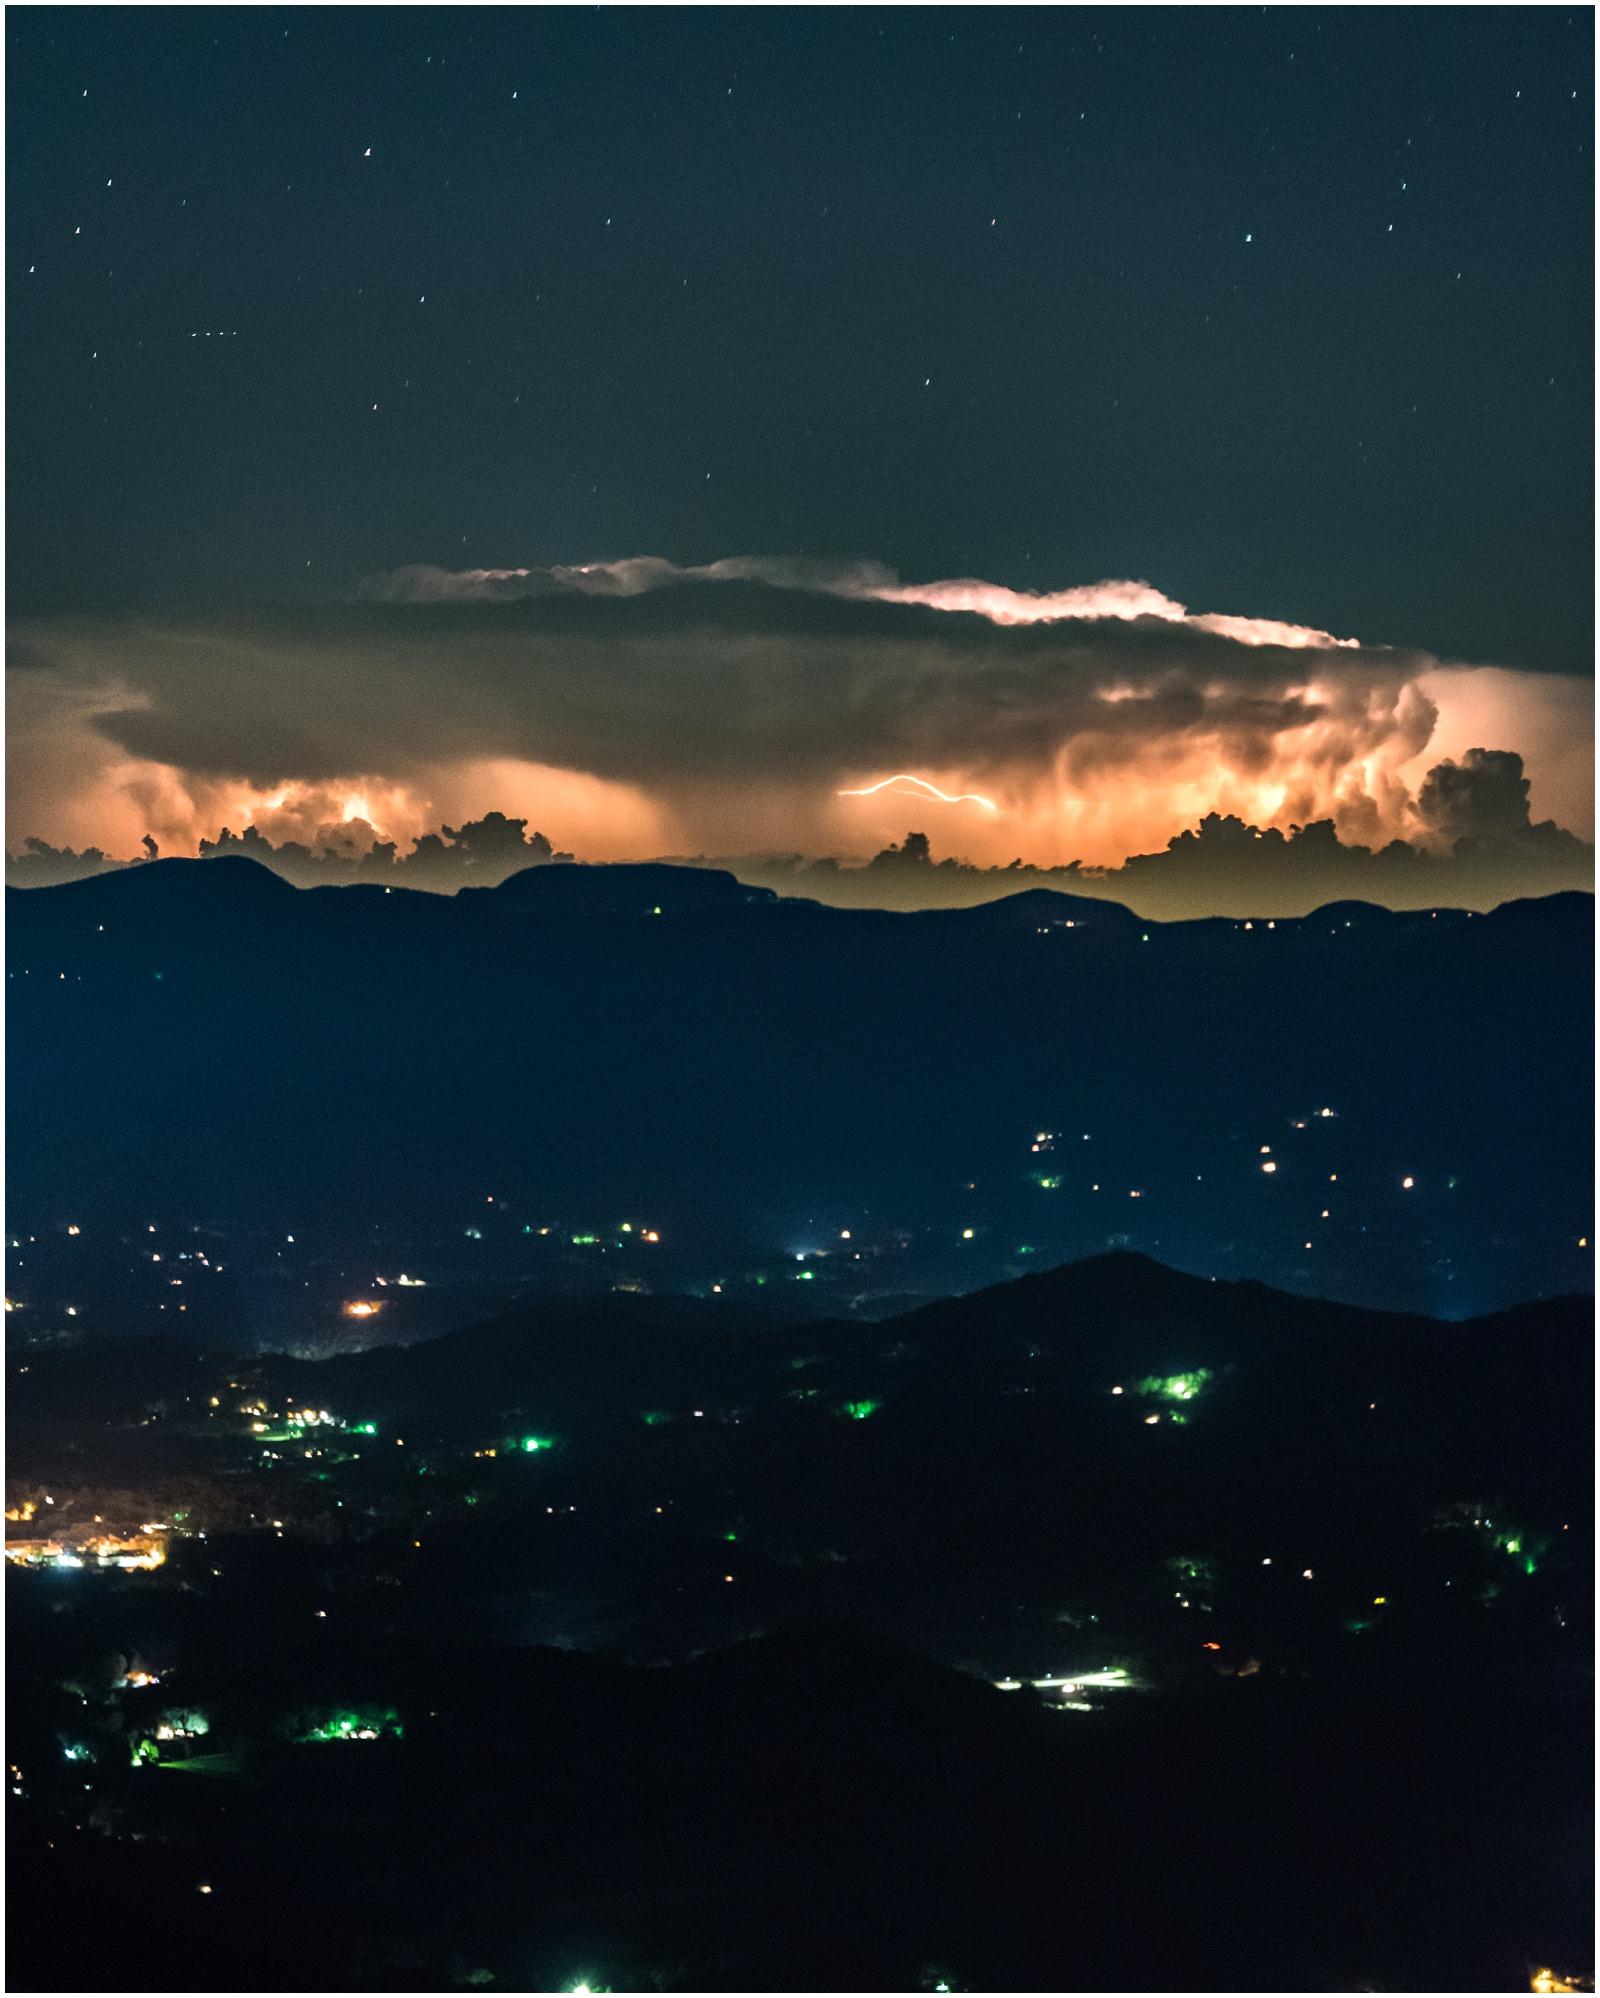 Lightning storm at night on Wayah Bald in North Carolina